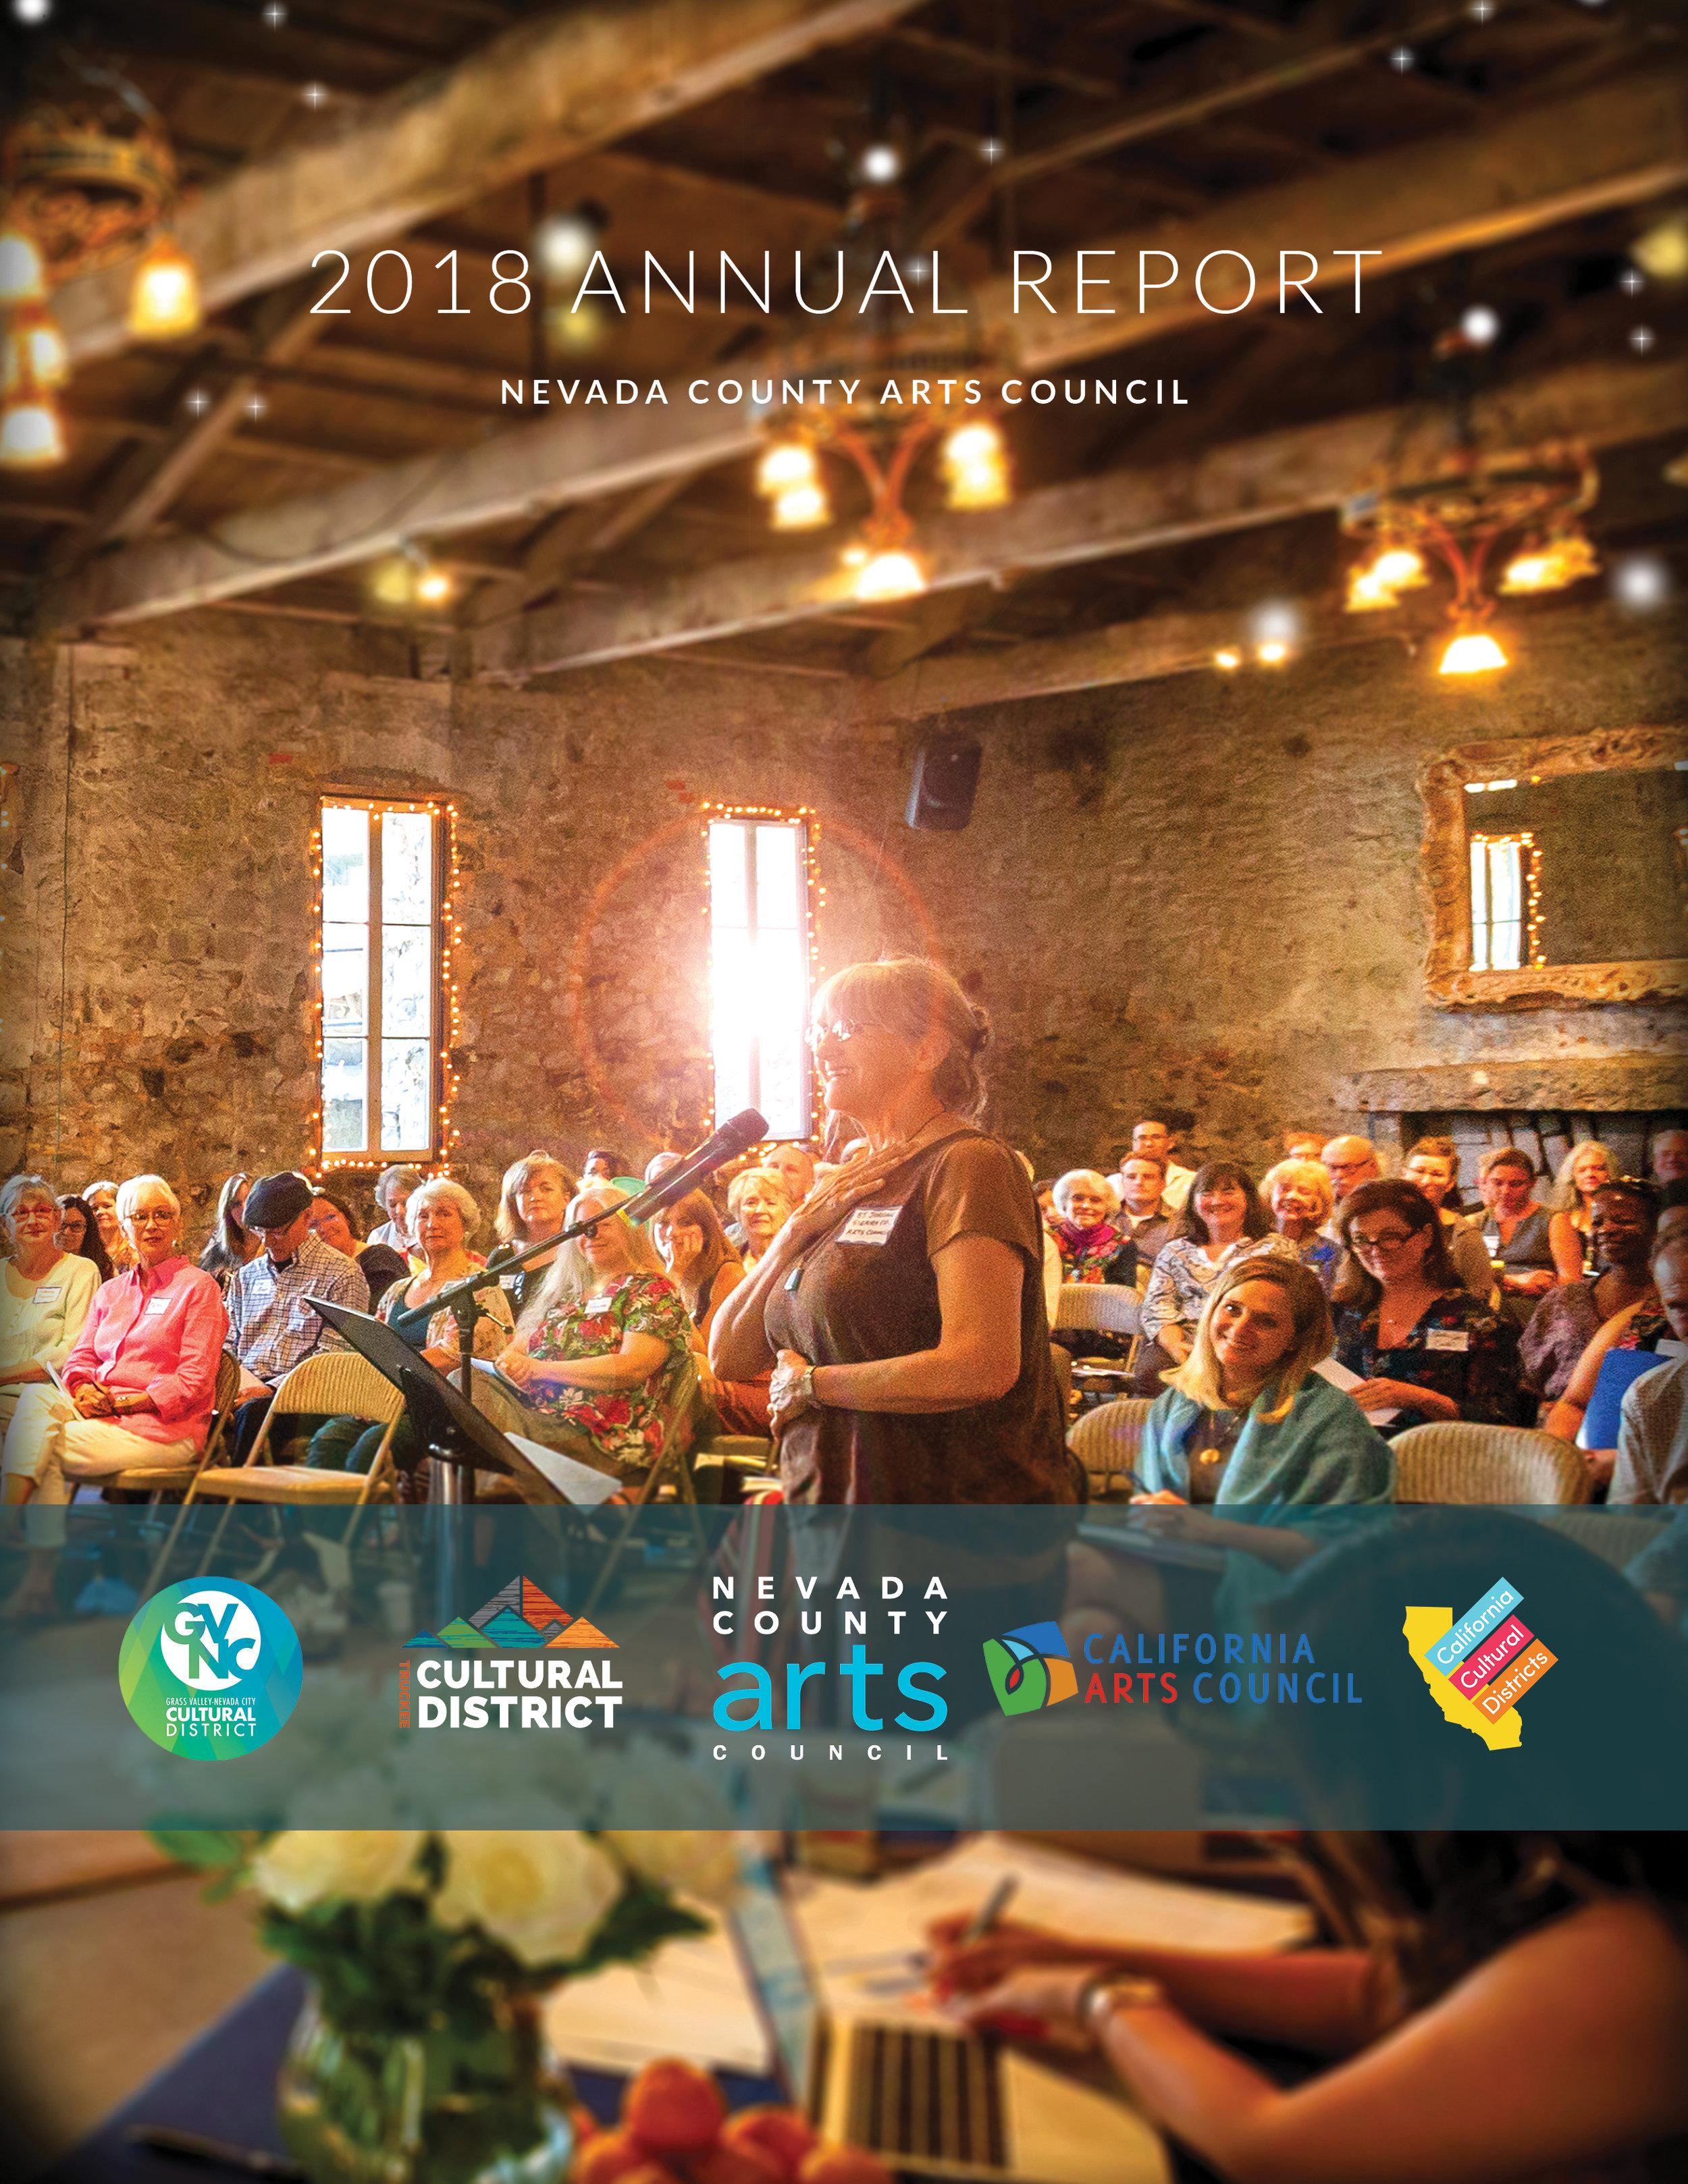 2018 Annual Report final.jpg